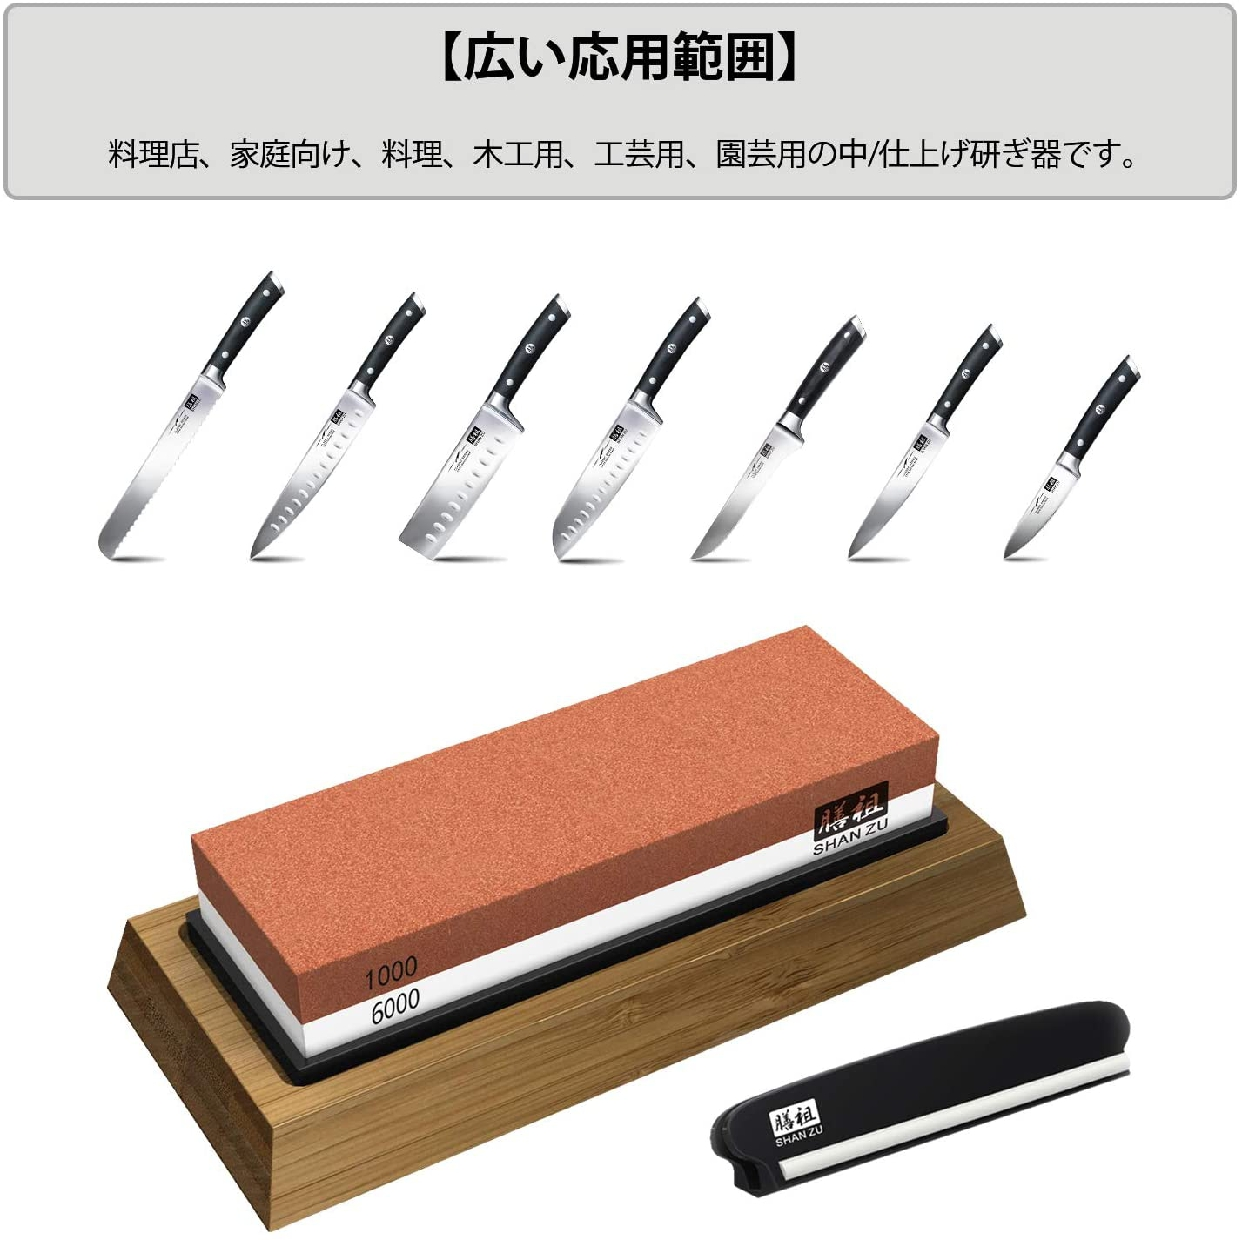 SHAN ZU 両面砥石 #1000/#6000 21.5 x 9.5 x 5.5 cmの商品画像6